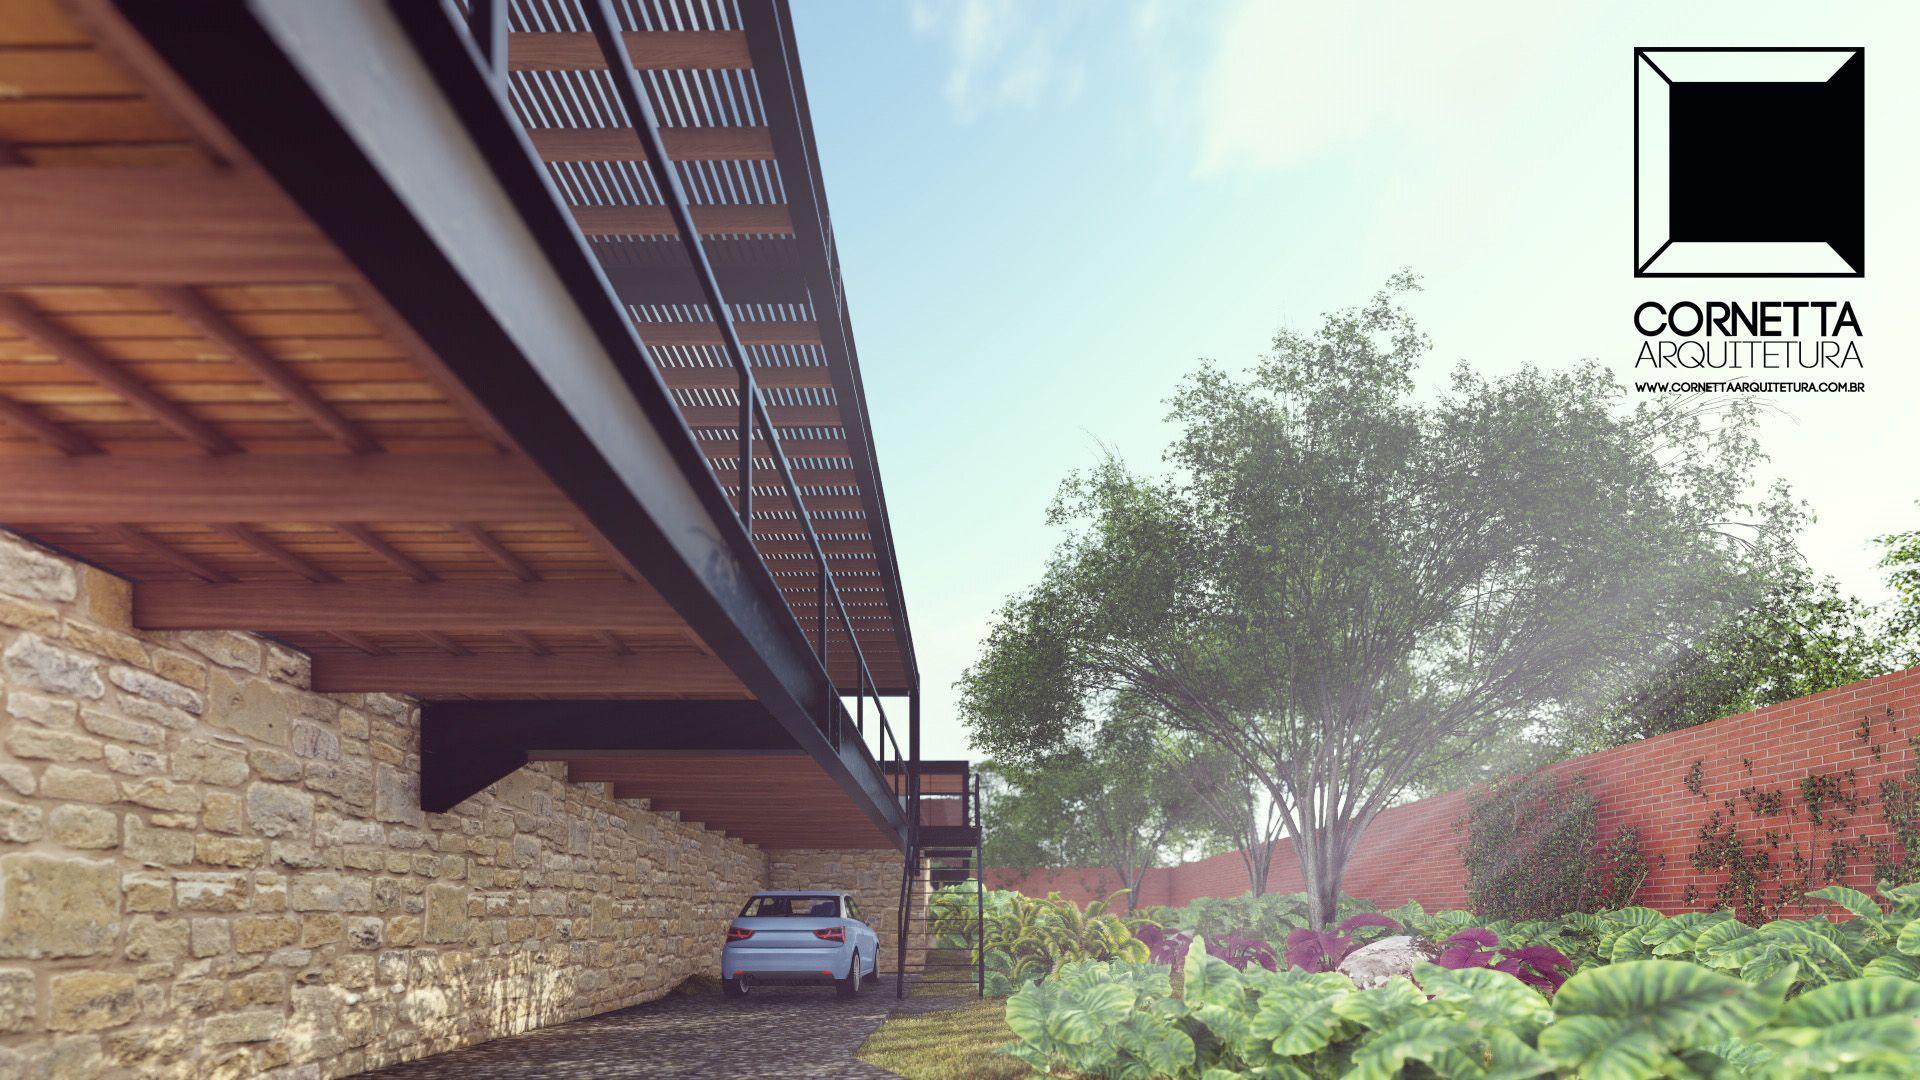 Casas prefabricadas casas estruturas metalicas casas - Casas prefabricadas ecologicas ...